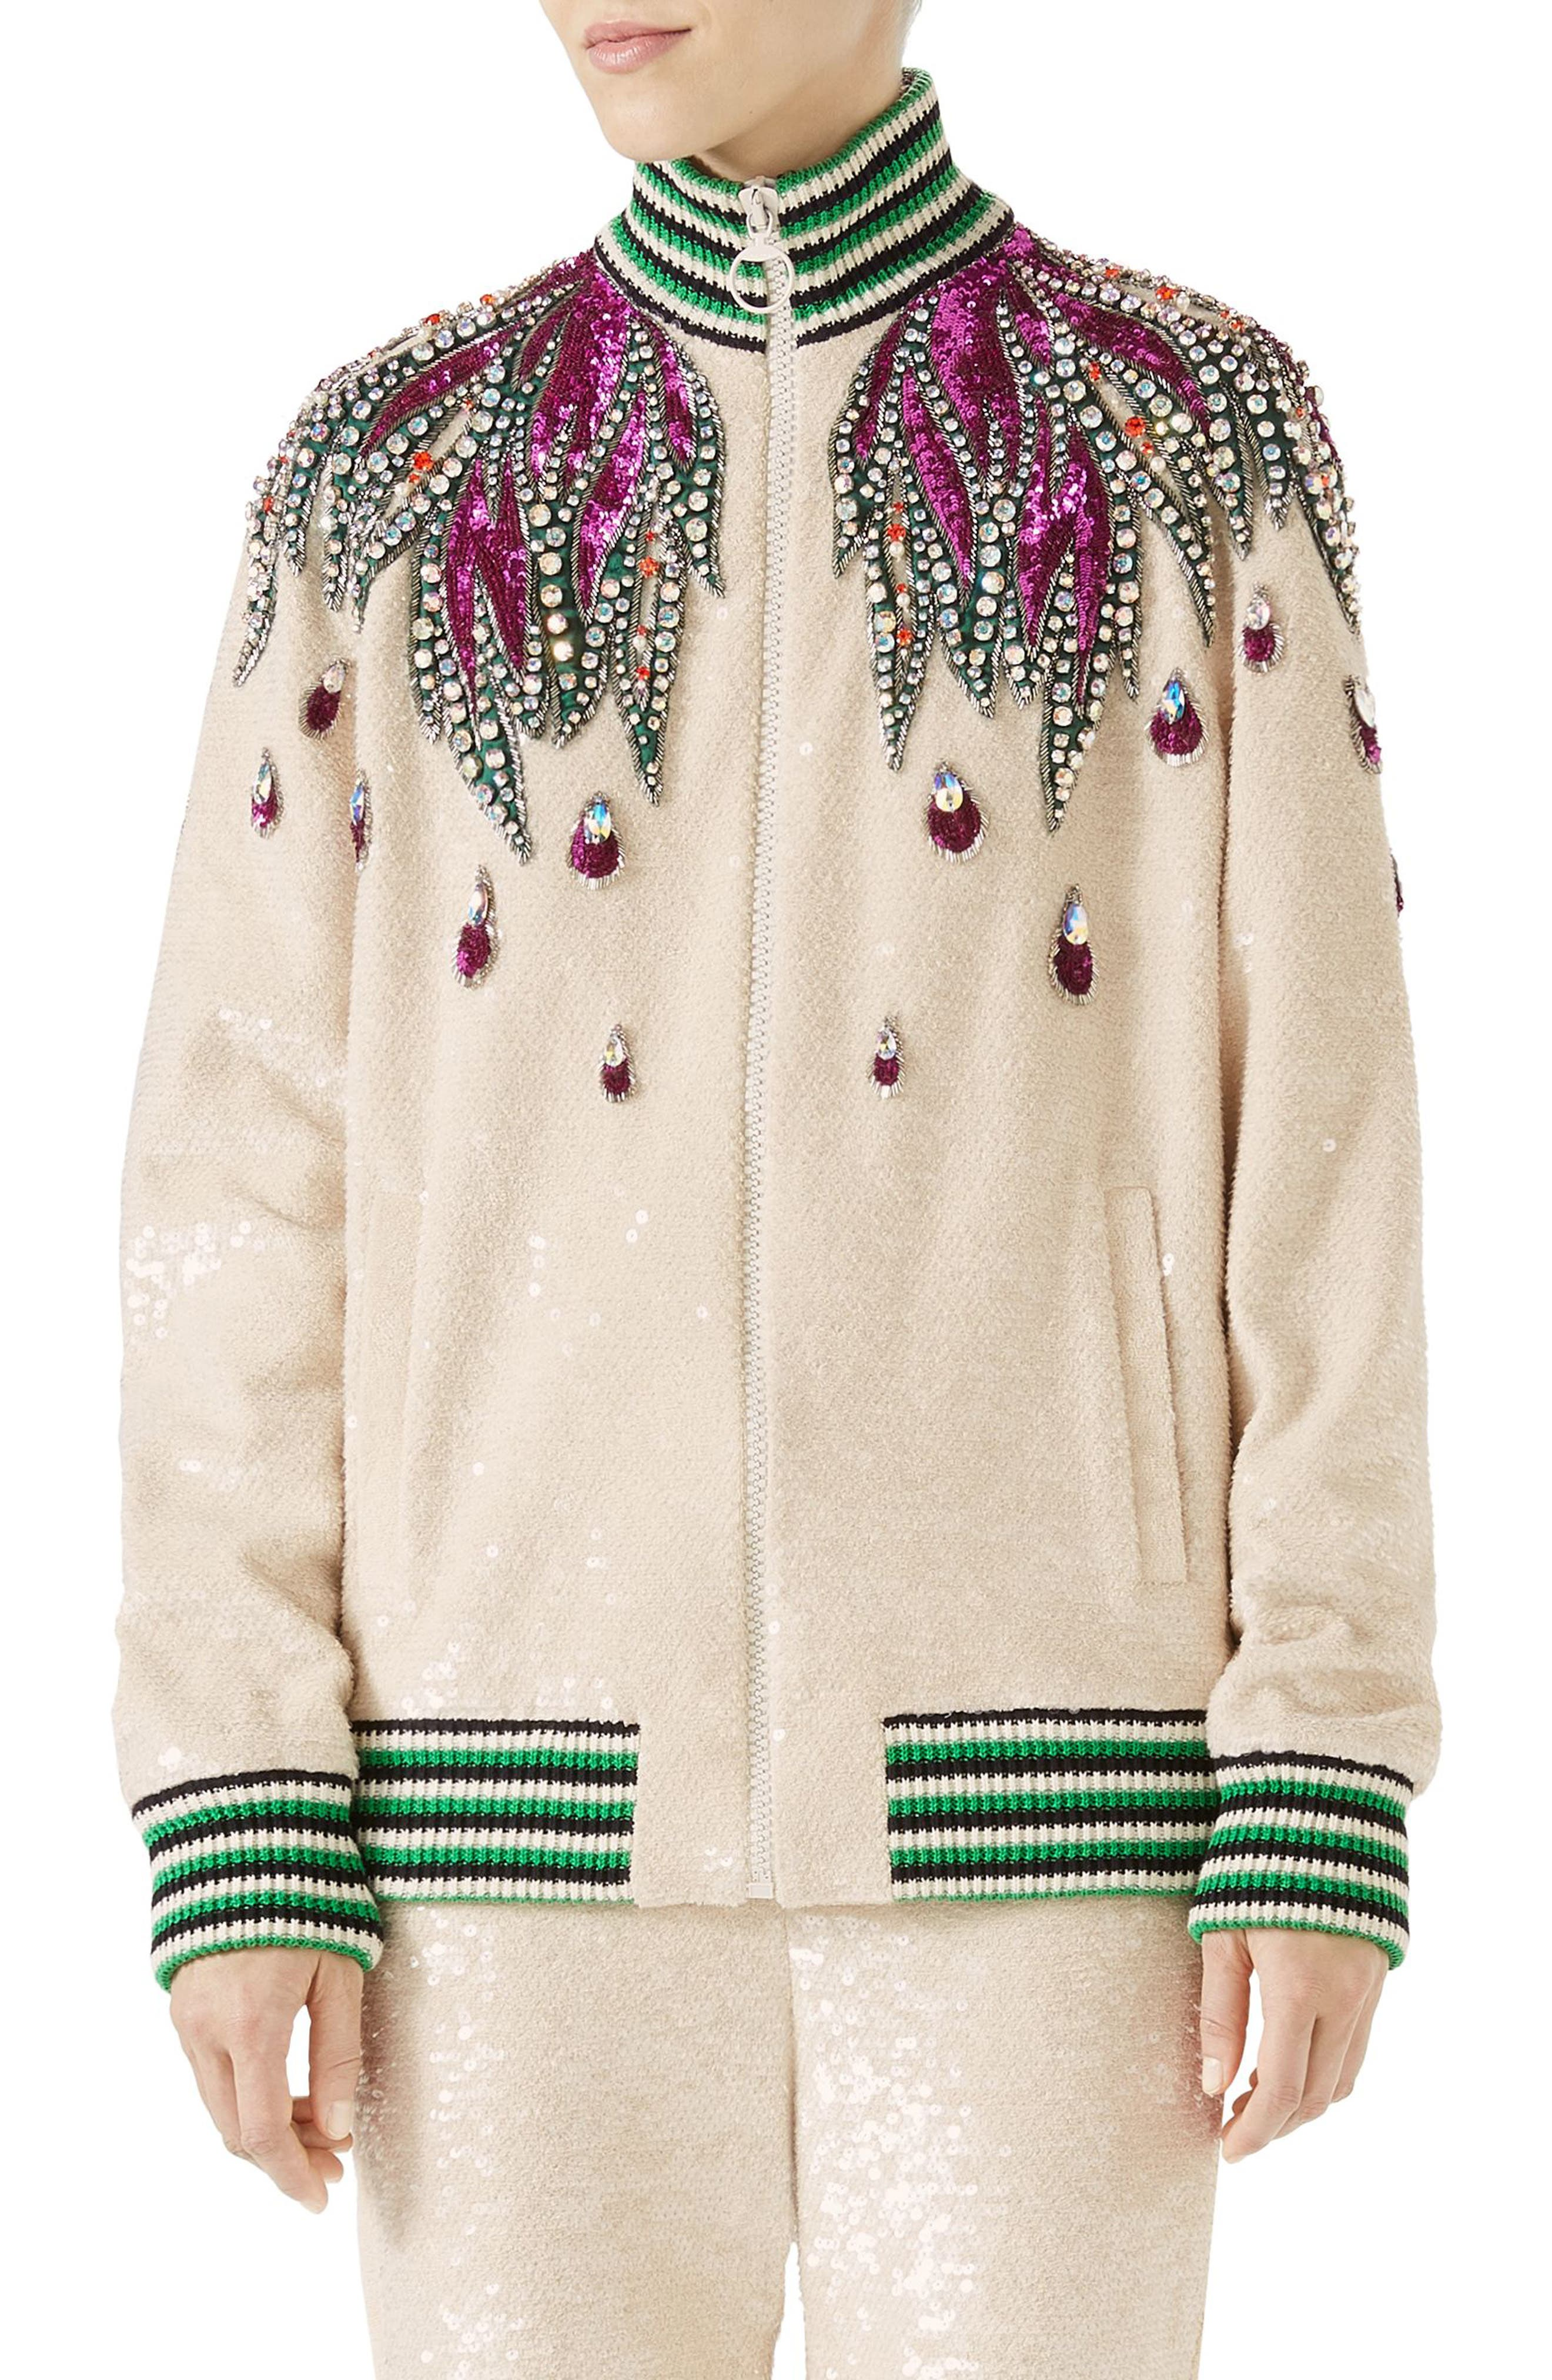 Embellished Track Jacket,                         Main,                         color, GARDENIA/ MULTICOLOR